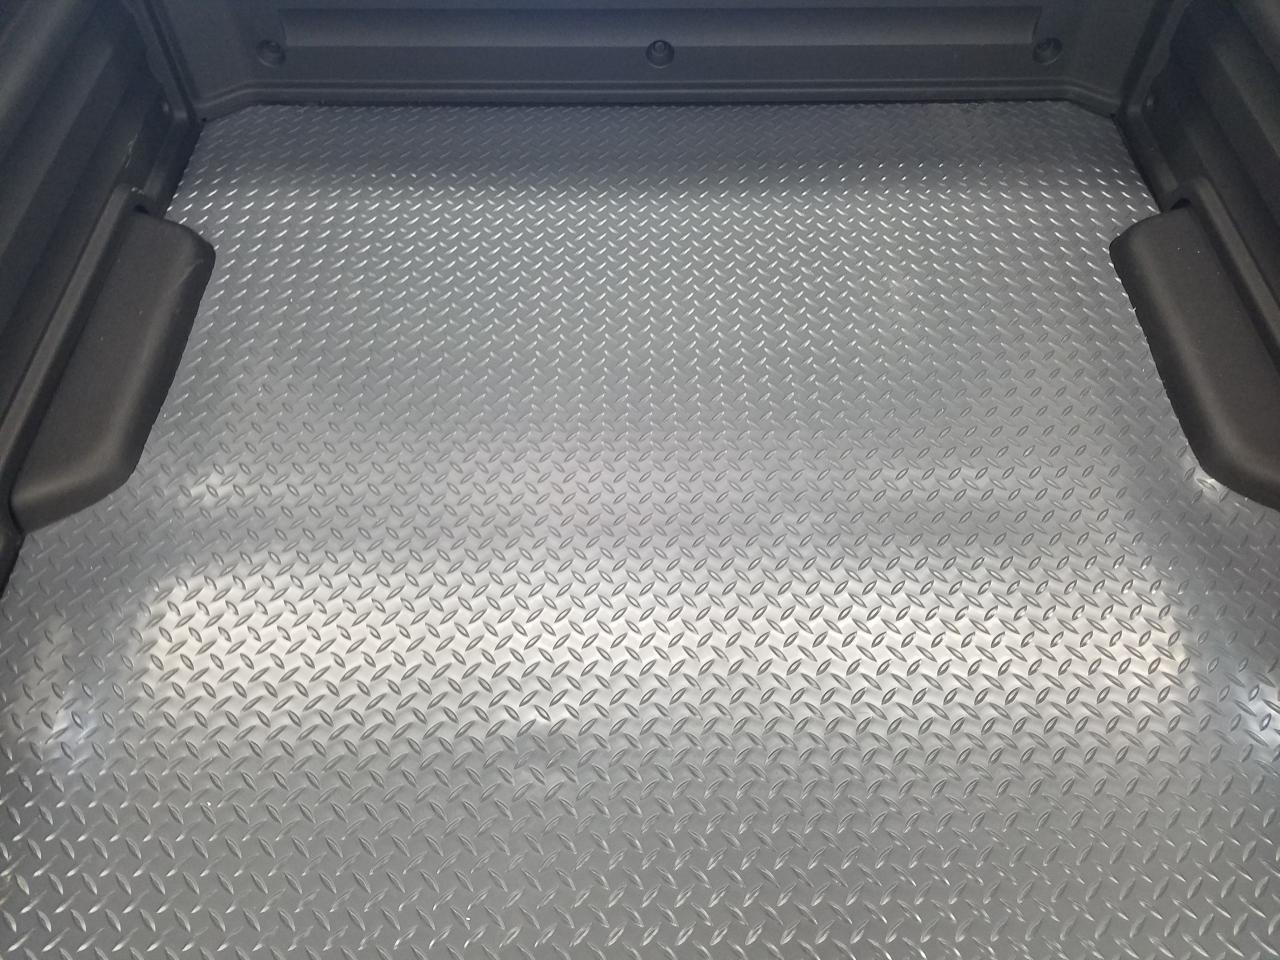 Floor mats honda ridgeline - Attachment 248466